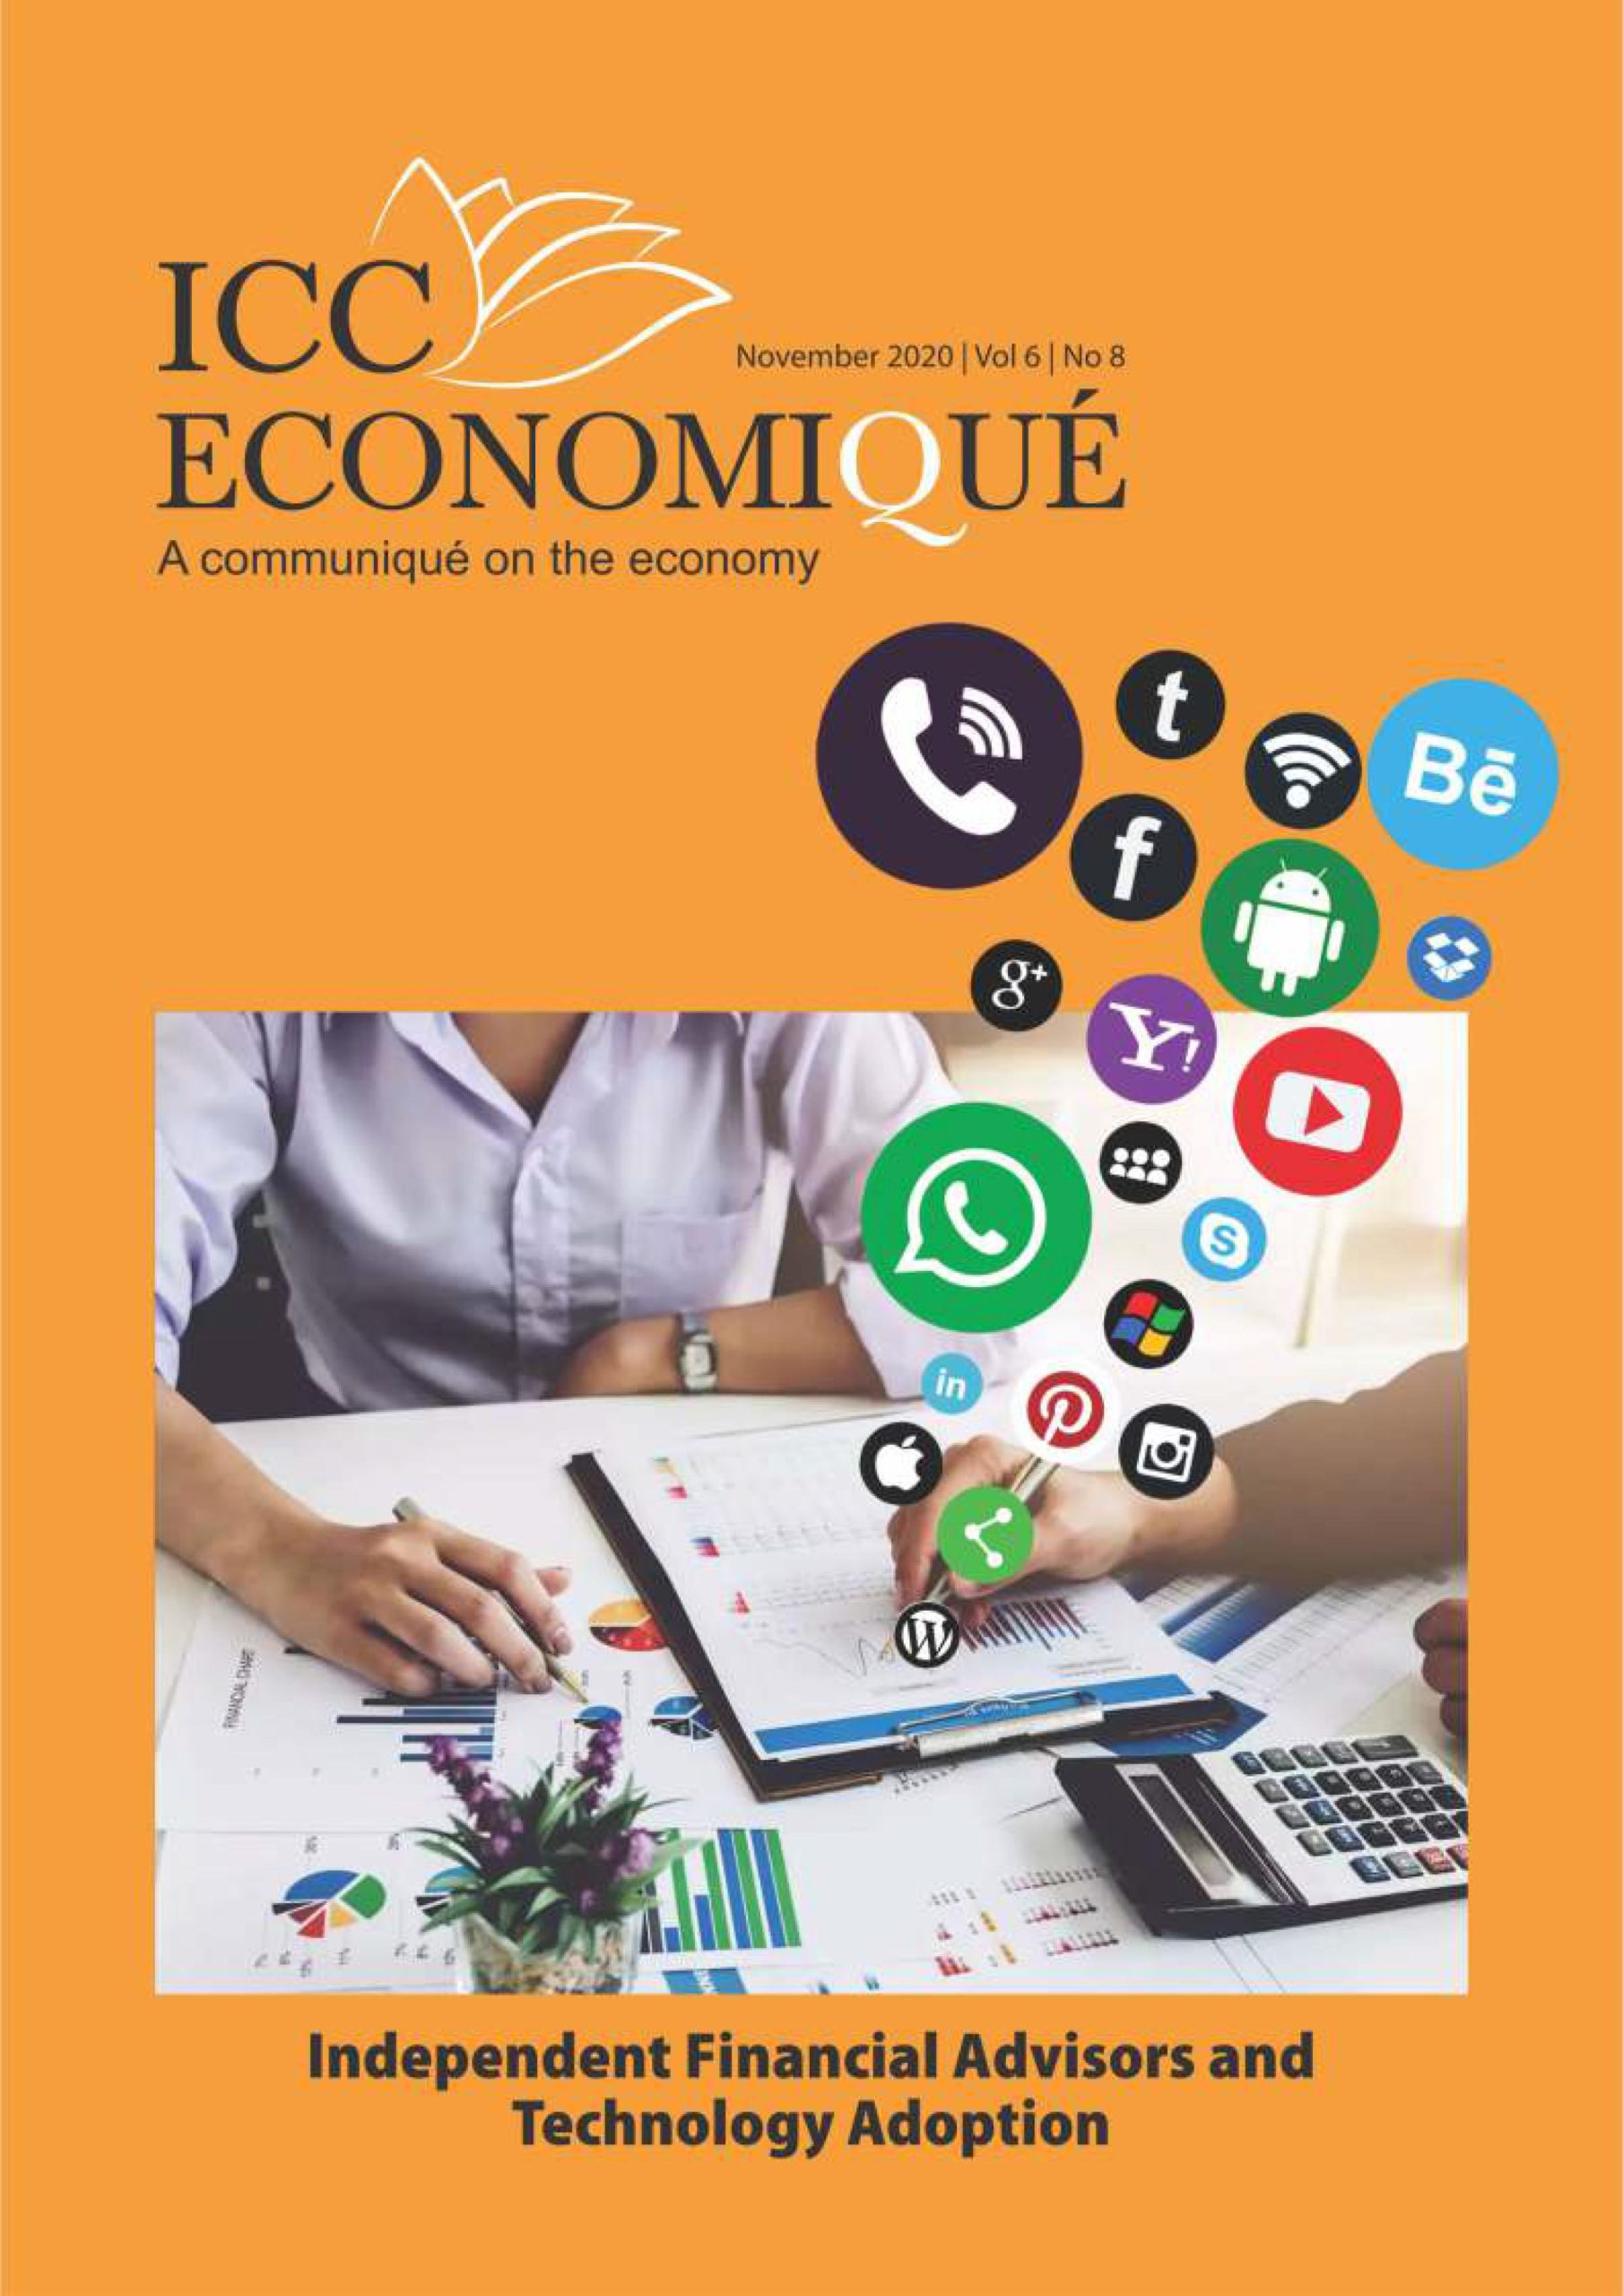 ICC Economique November 2020 | Vol 6 | No 8